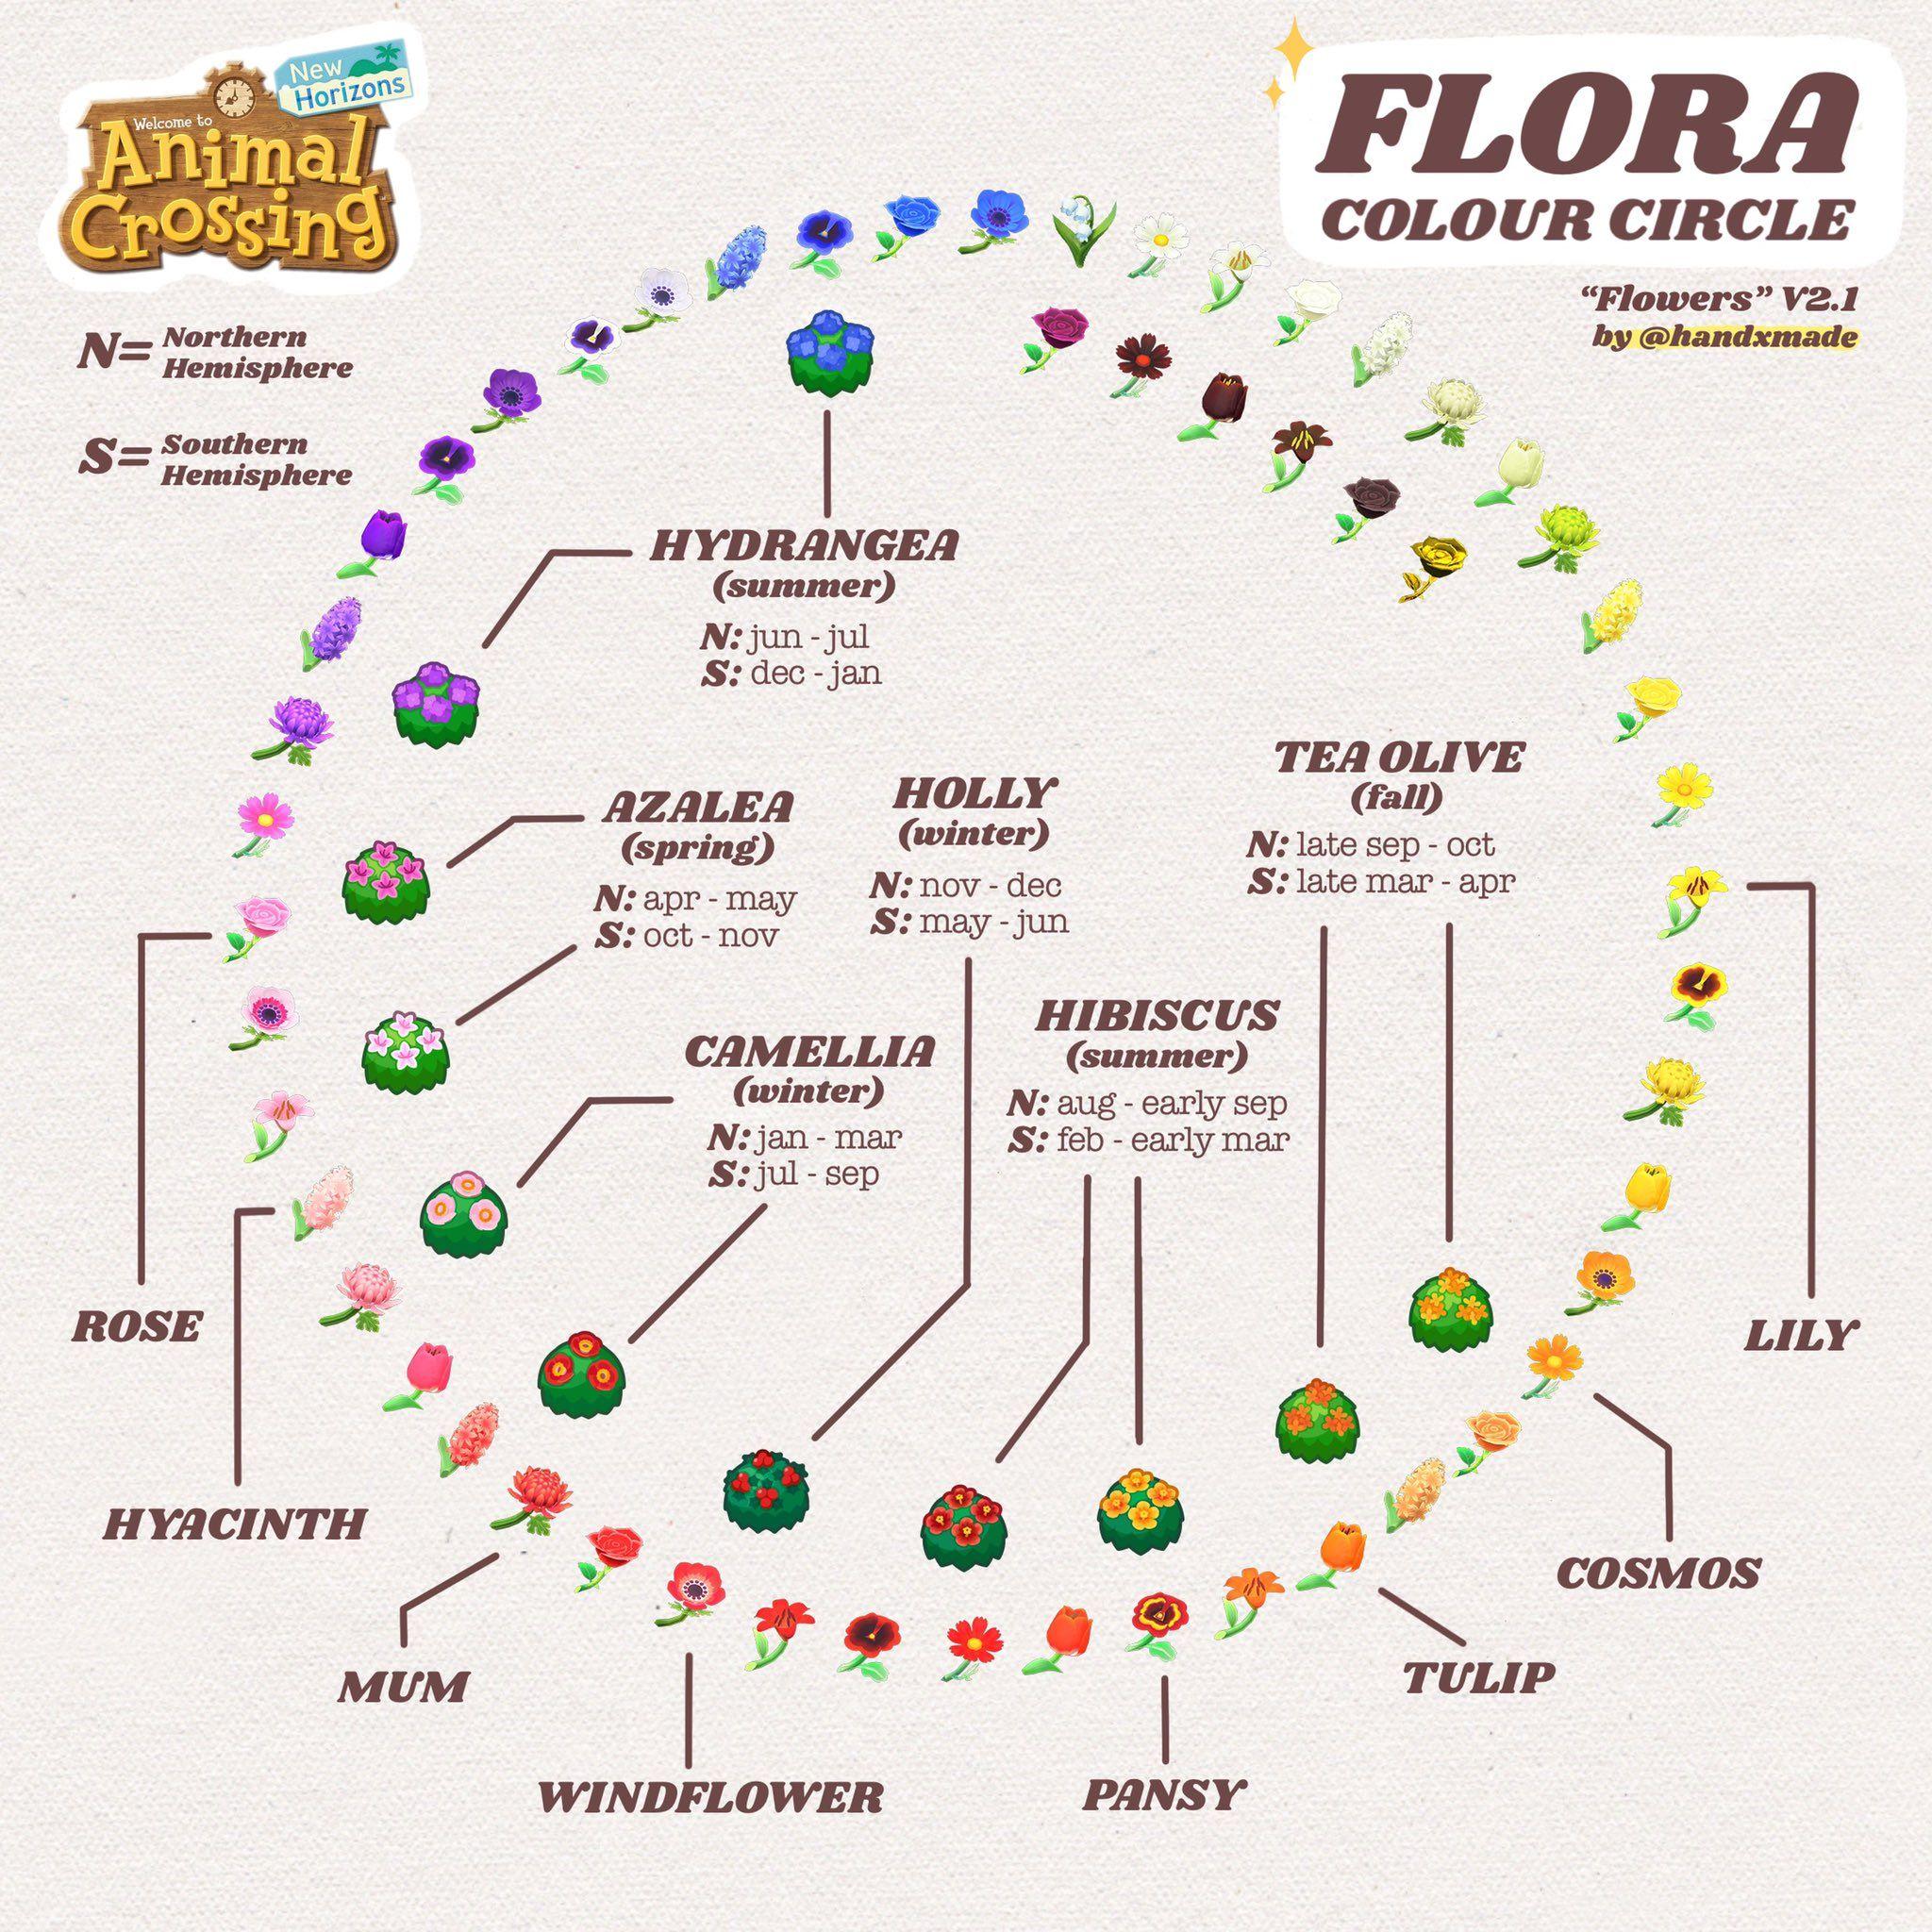 Flora colour circle in 2020 Animal crossing, Animal